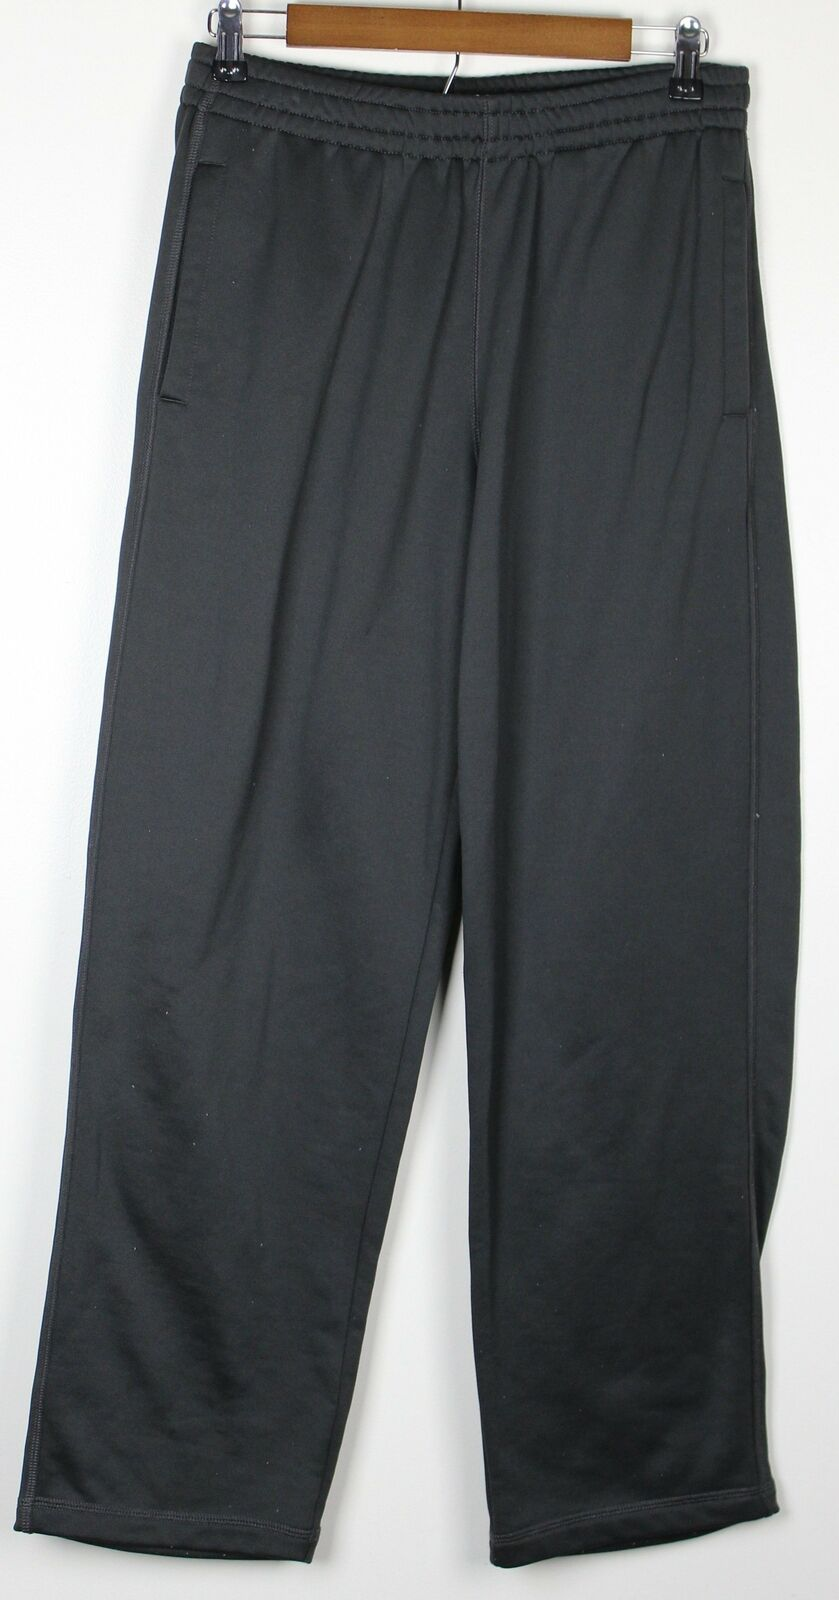 OLD NAVY Women's Activewear Pants Black Size M